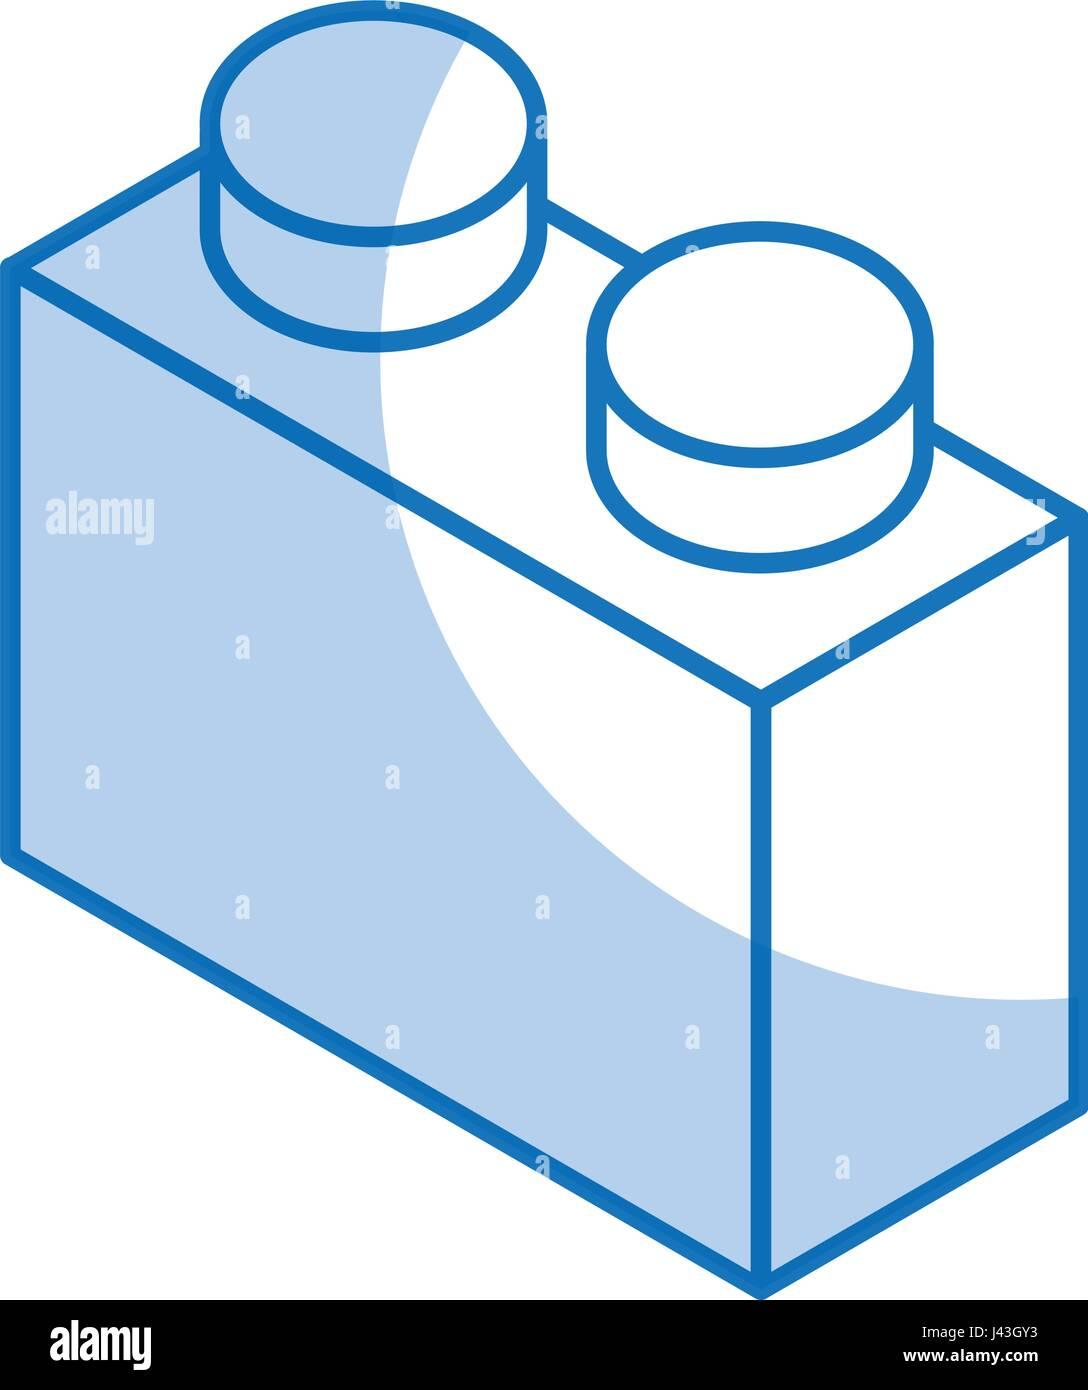 isometrische Block Spielstein Stockbild